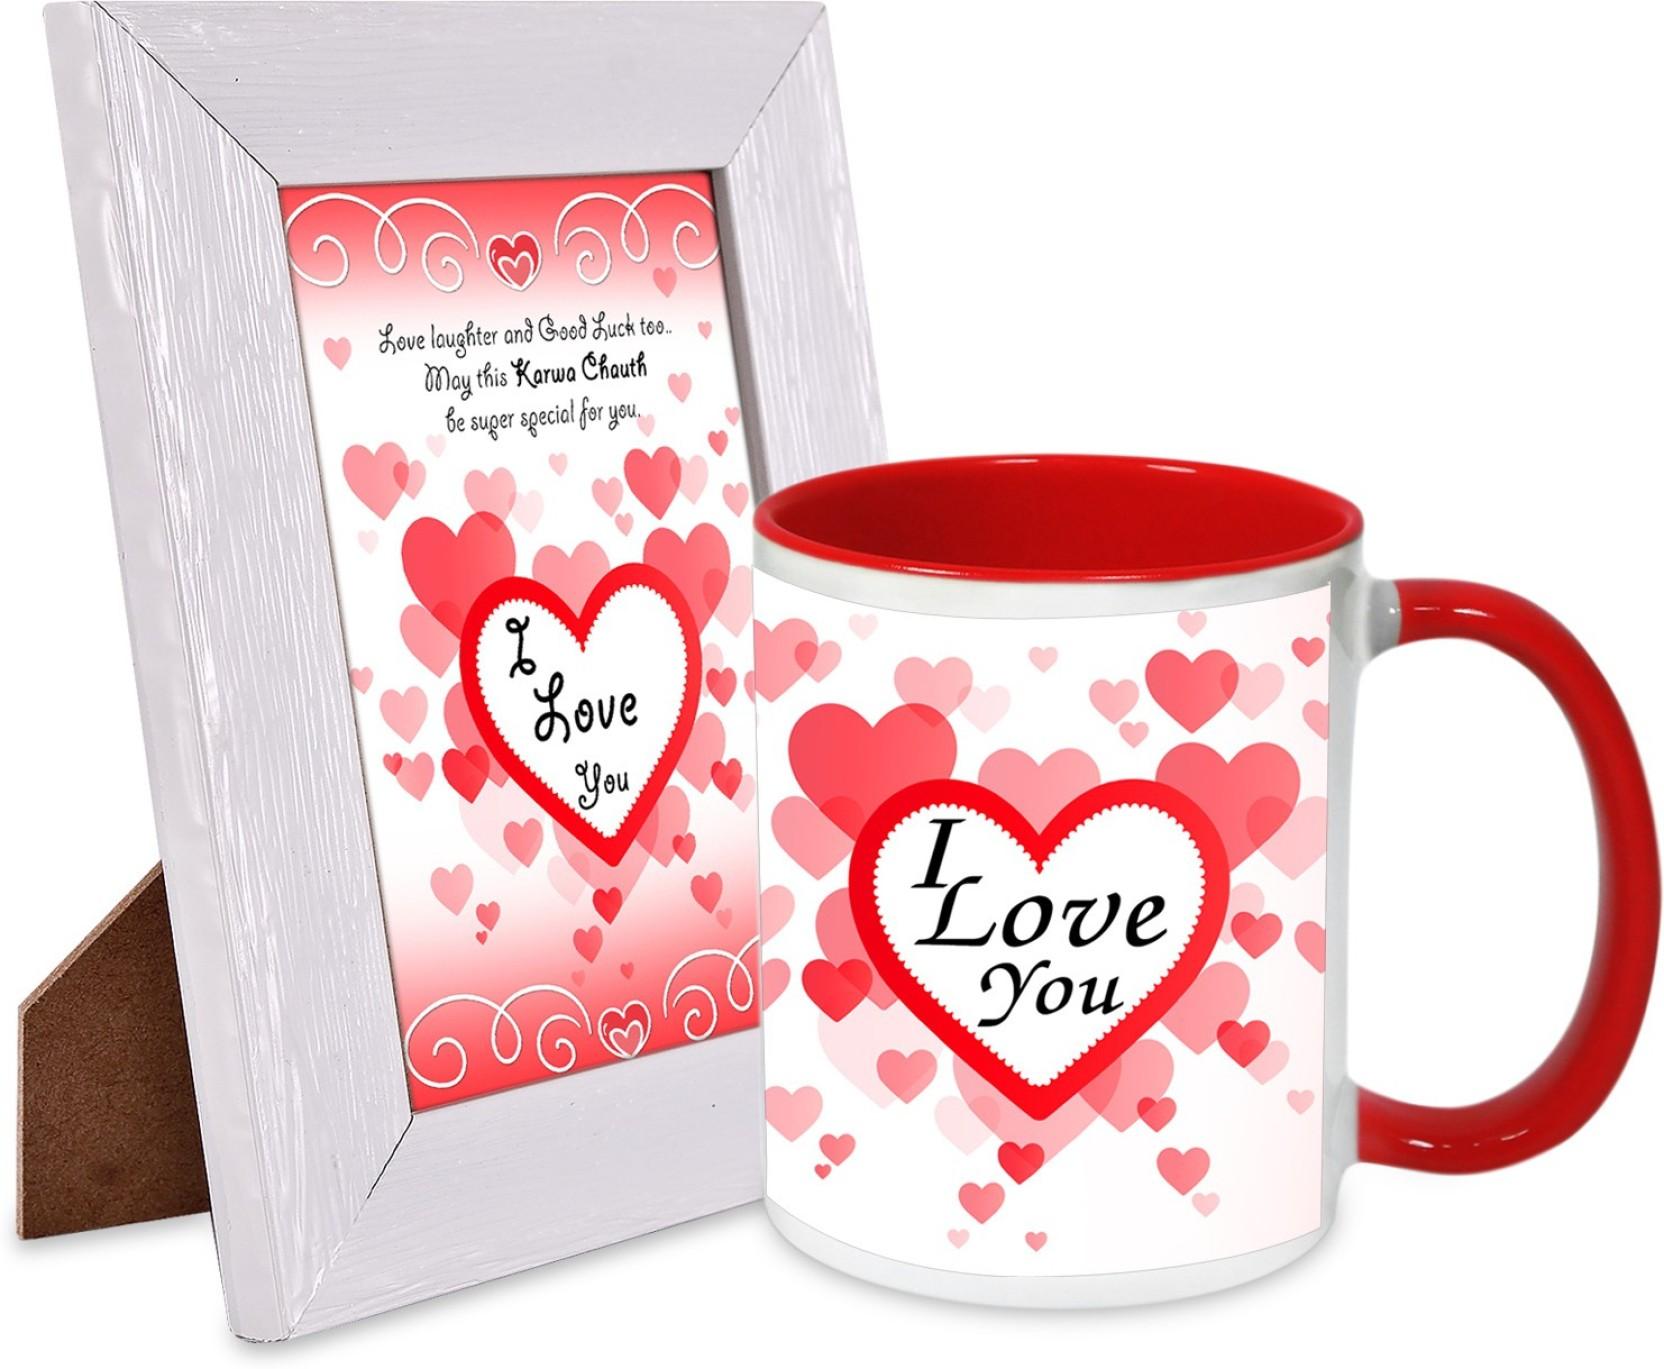 alwaysgift Special Karwa Chauth Quotation Frame & Mug Hamper Mug ...